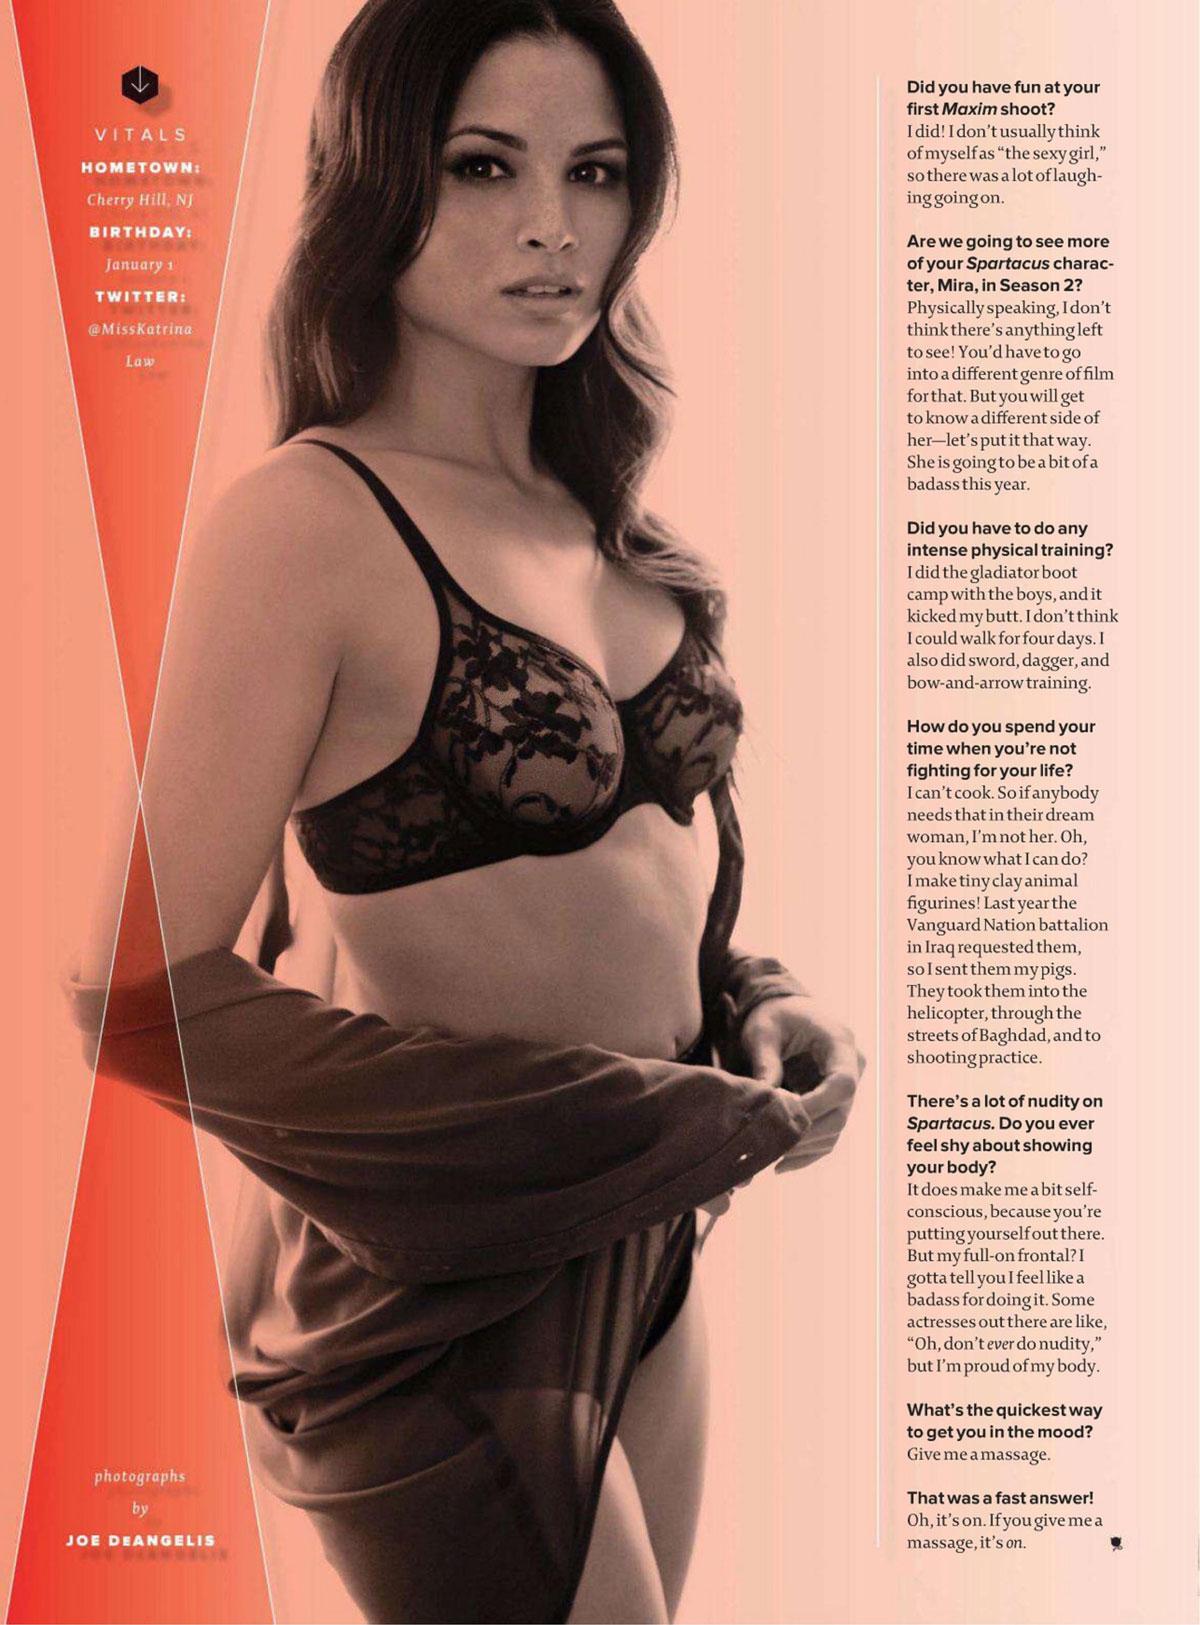 ... Law in Maxim Magazine, April 2012 Issue - HawtCelebs - HawtCelebs